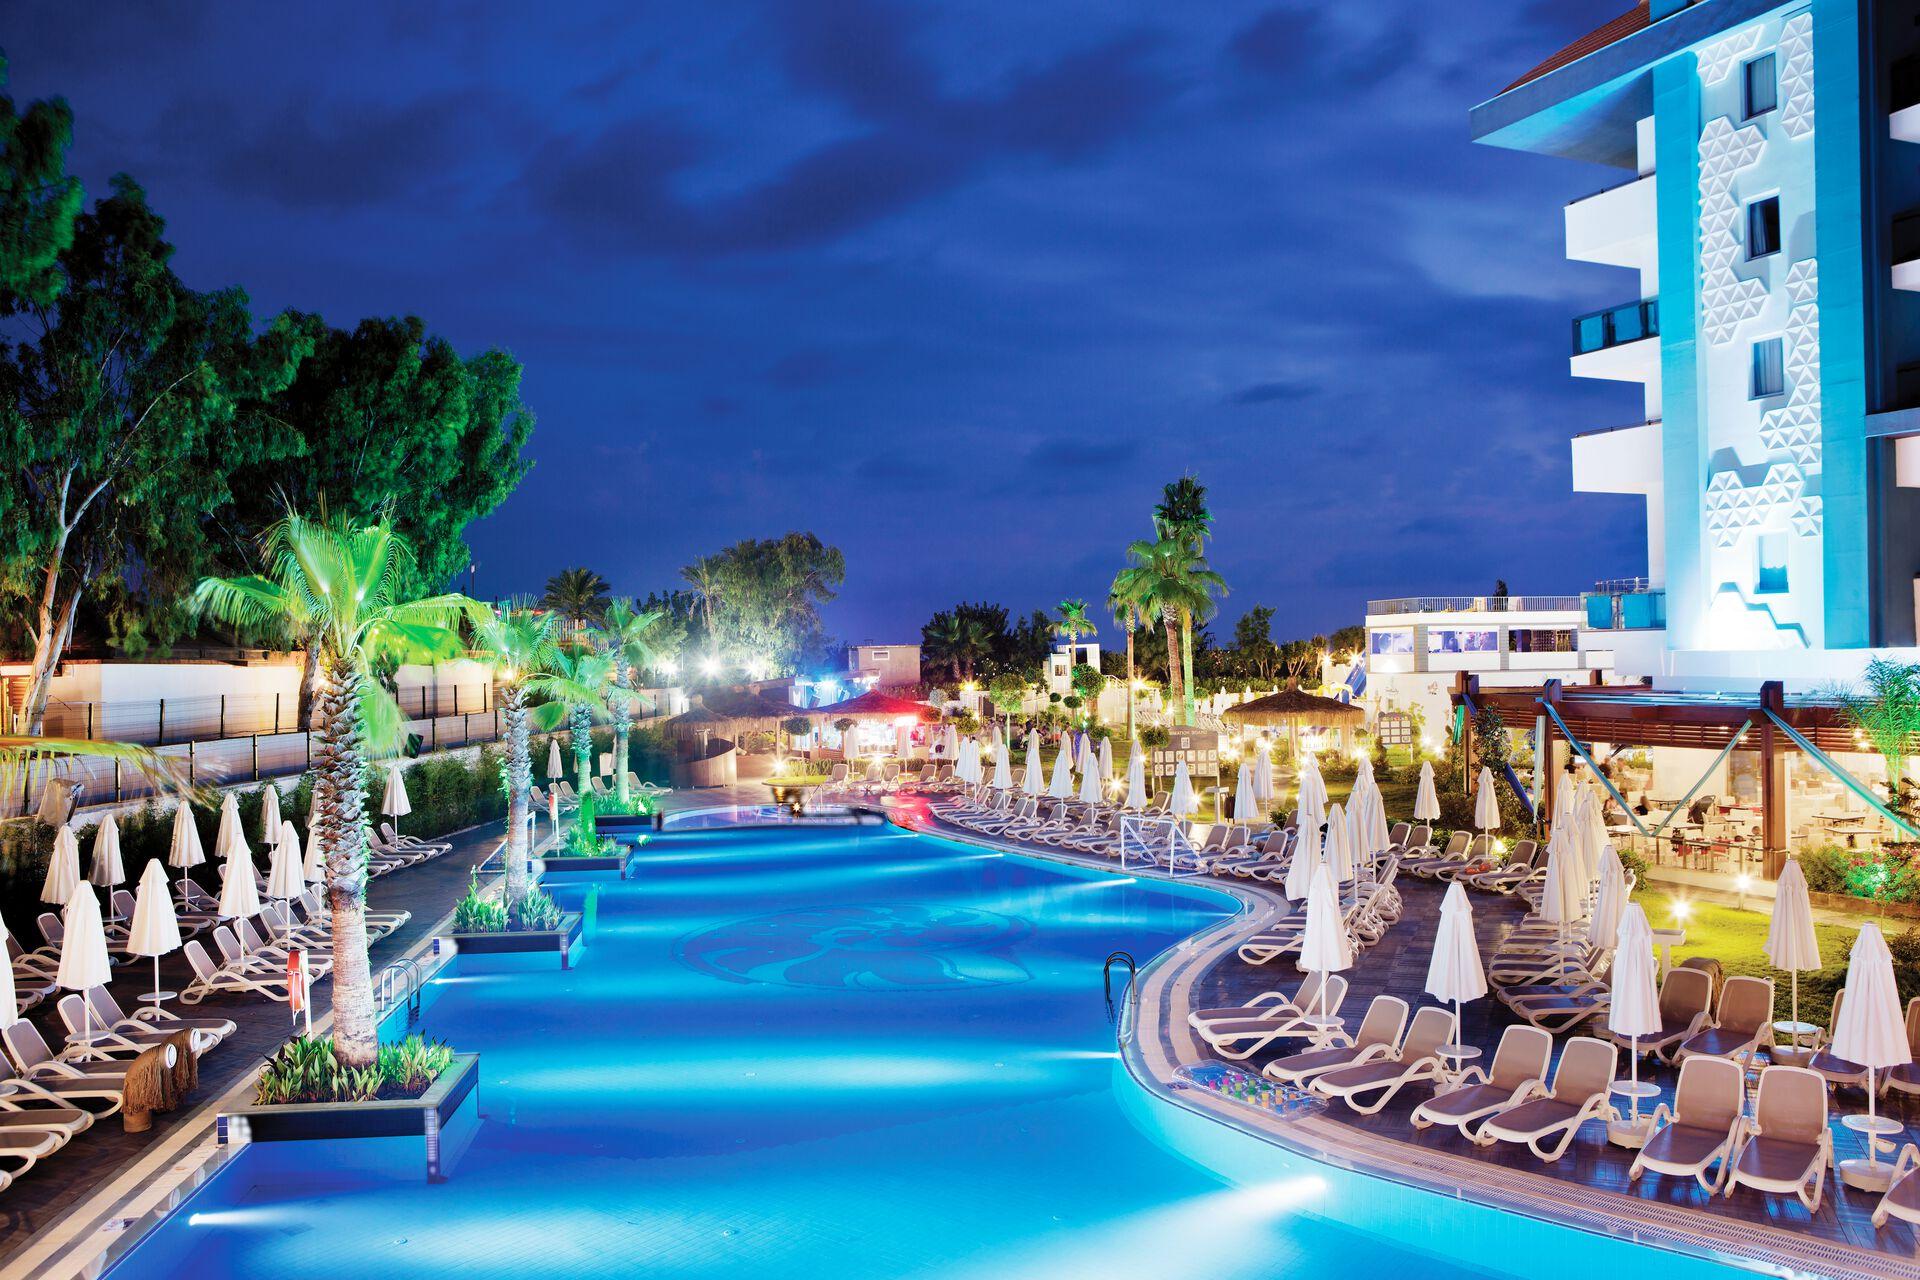 Turquie - Side - Hôtel Seashell Resort & Spa 5*